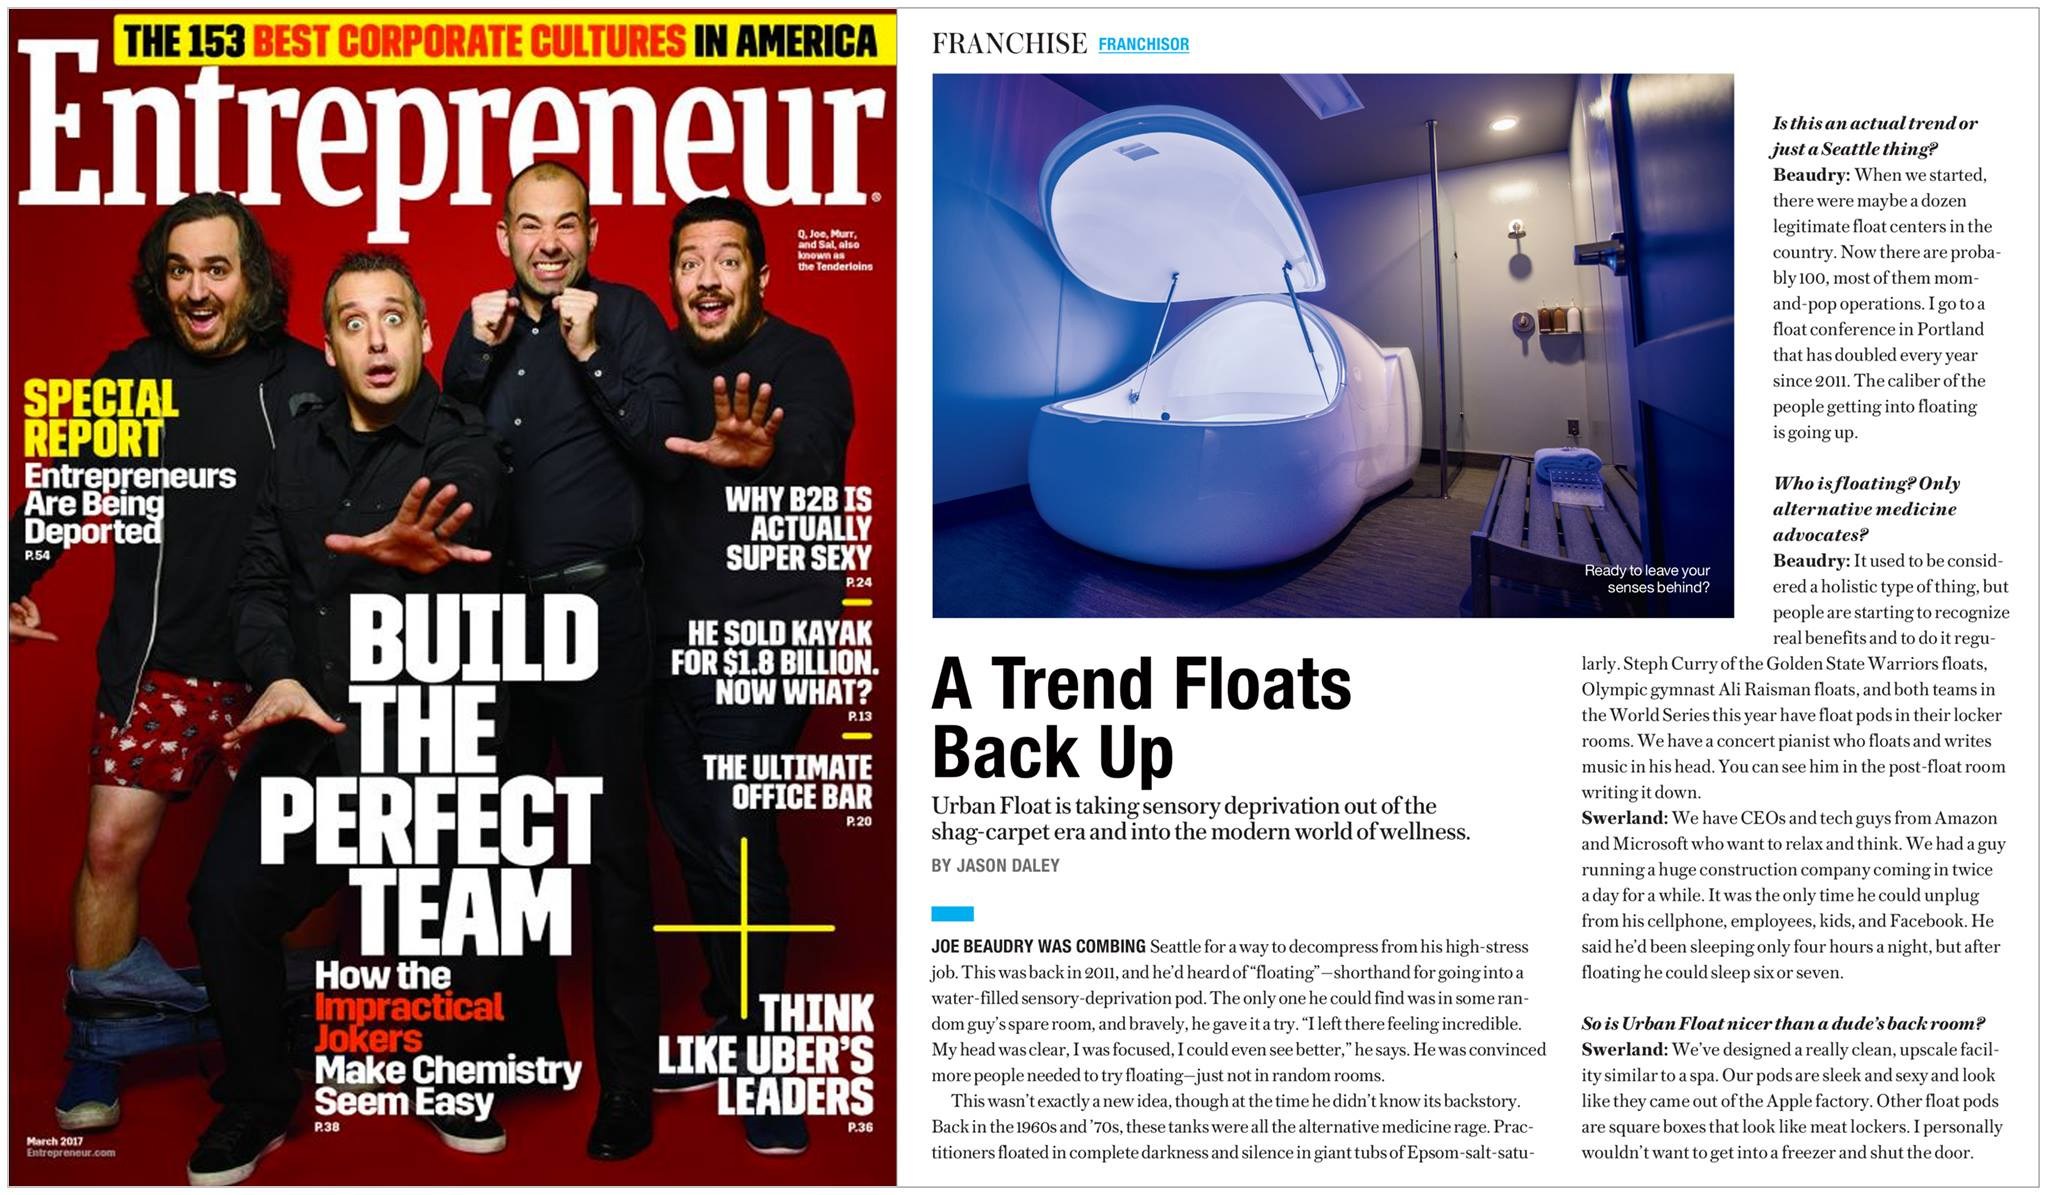 Entrepreneur Magazine - Urban Float Article Feature